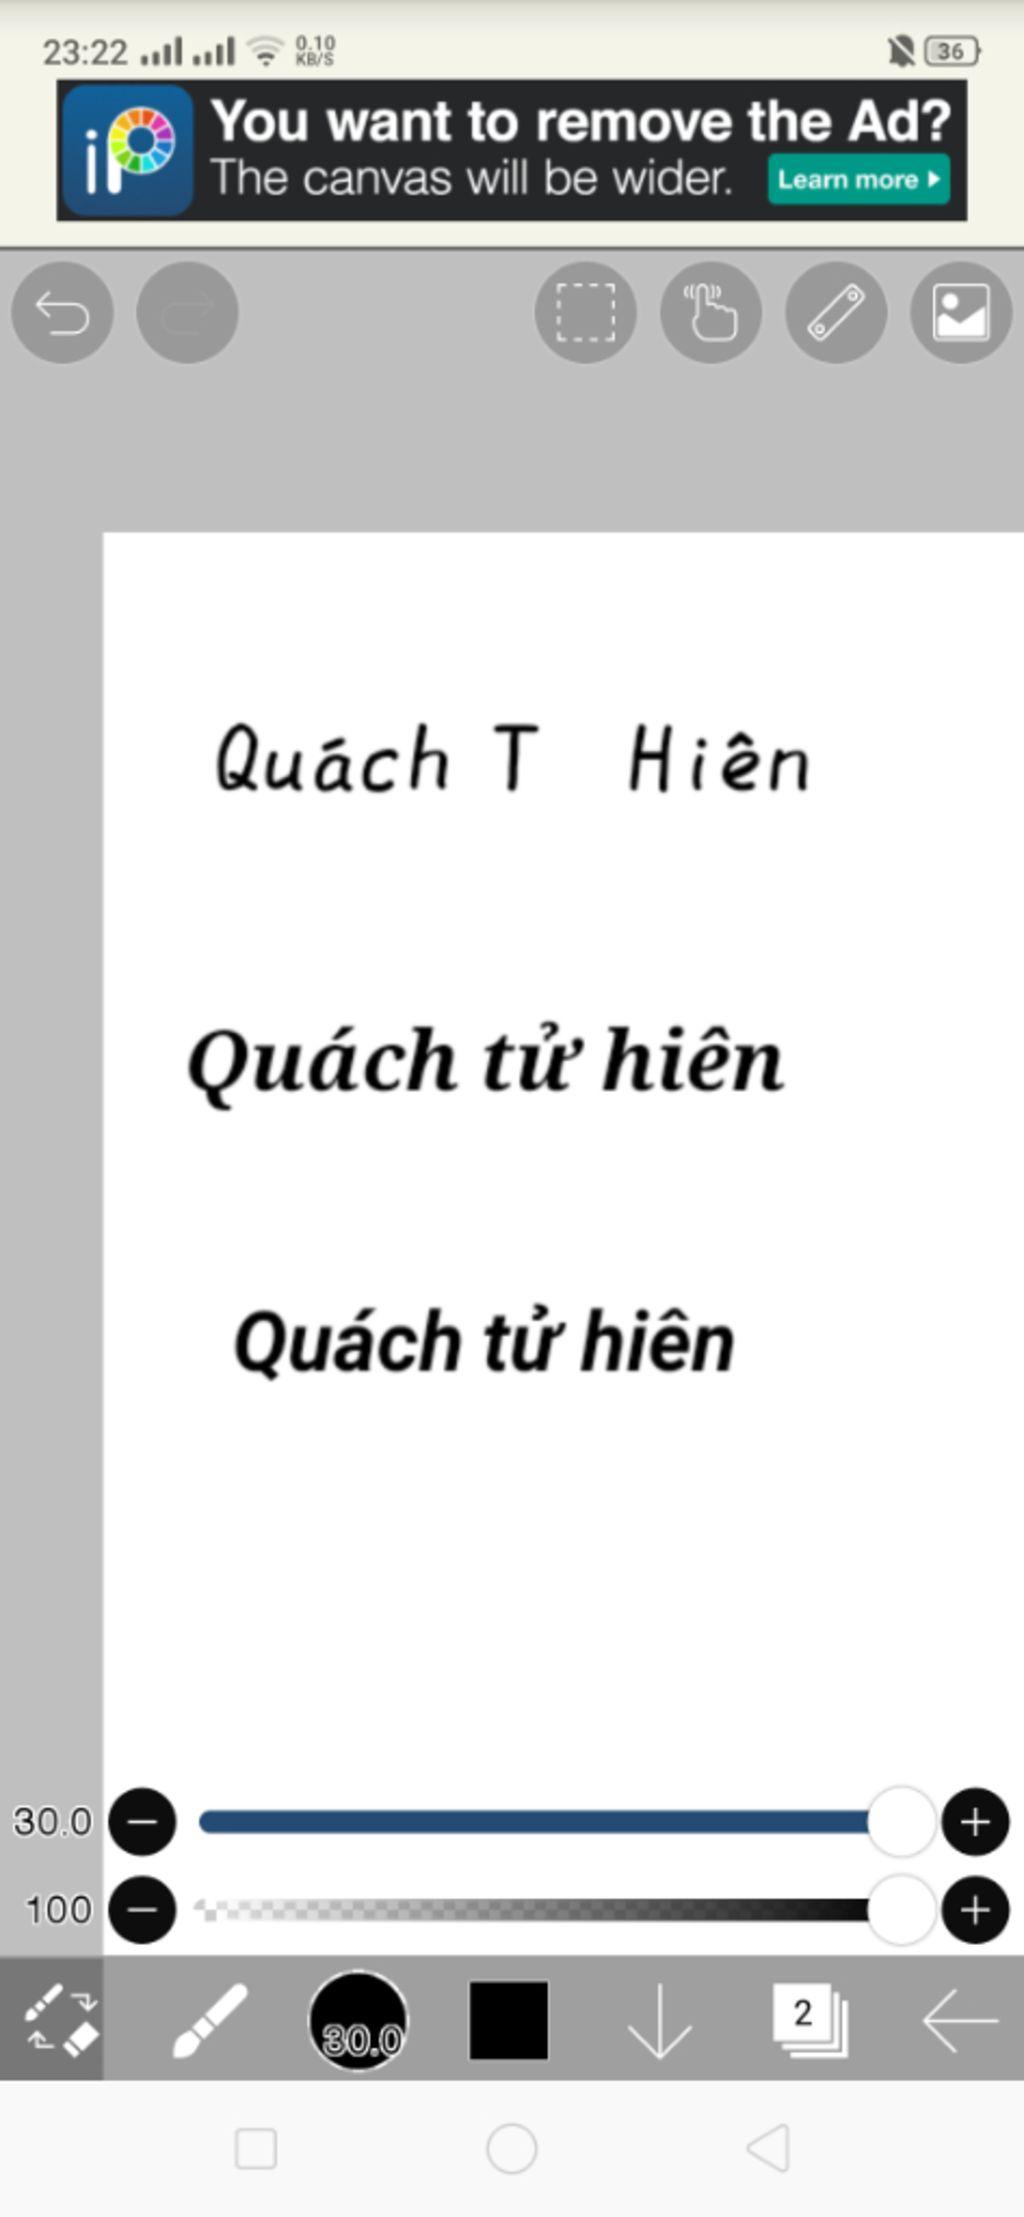 viet-cho-mik-ten-quach-tu-hien-nha-mn-ve-bang-giay-nha-mong-cac-ban-ve-dep